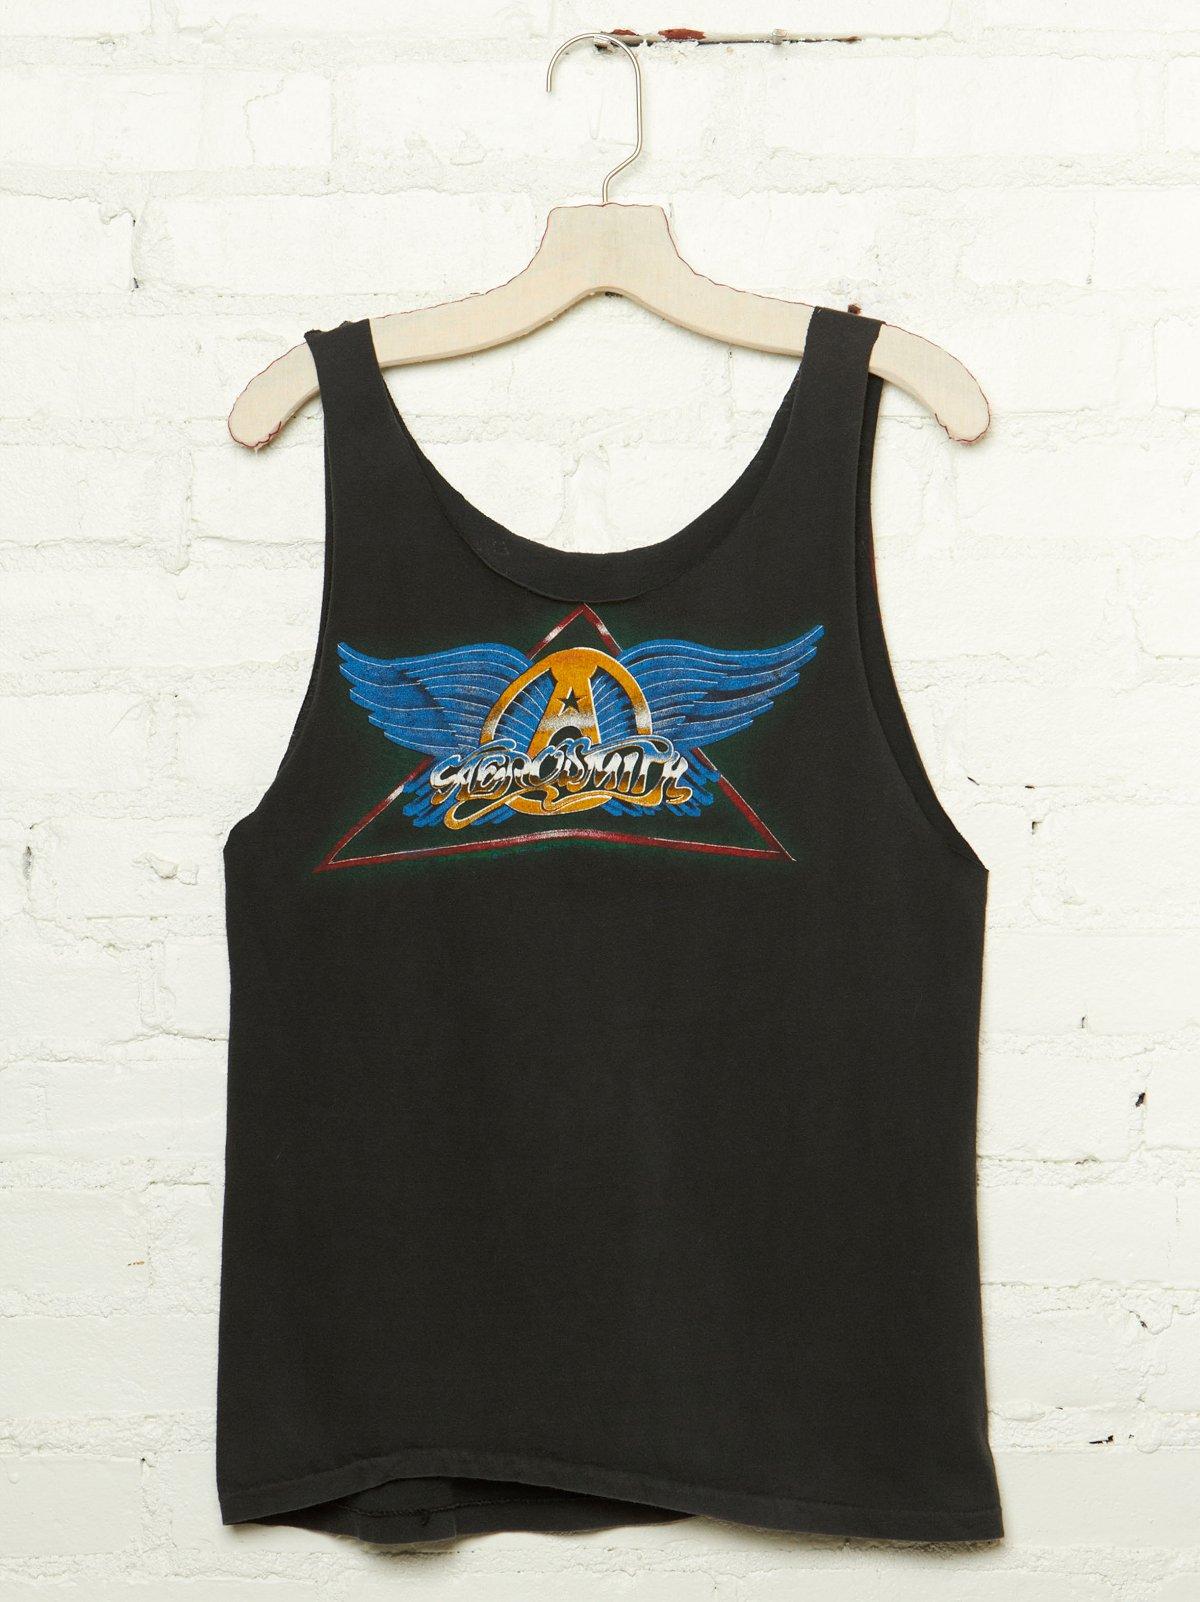 Vintage Aerosmith Graphic Tank